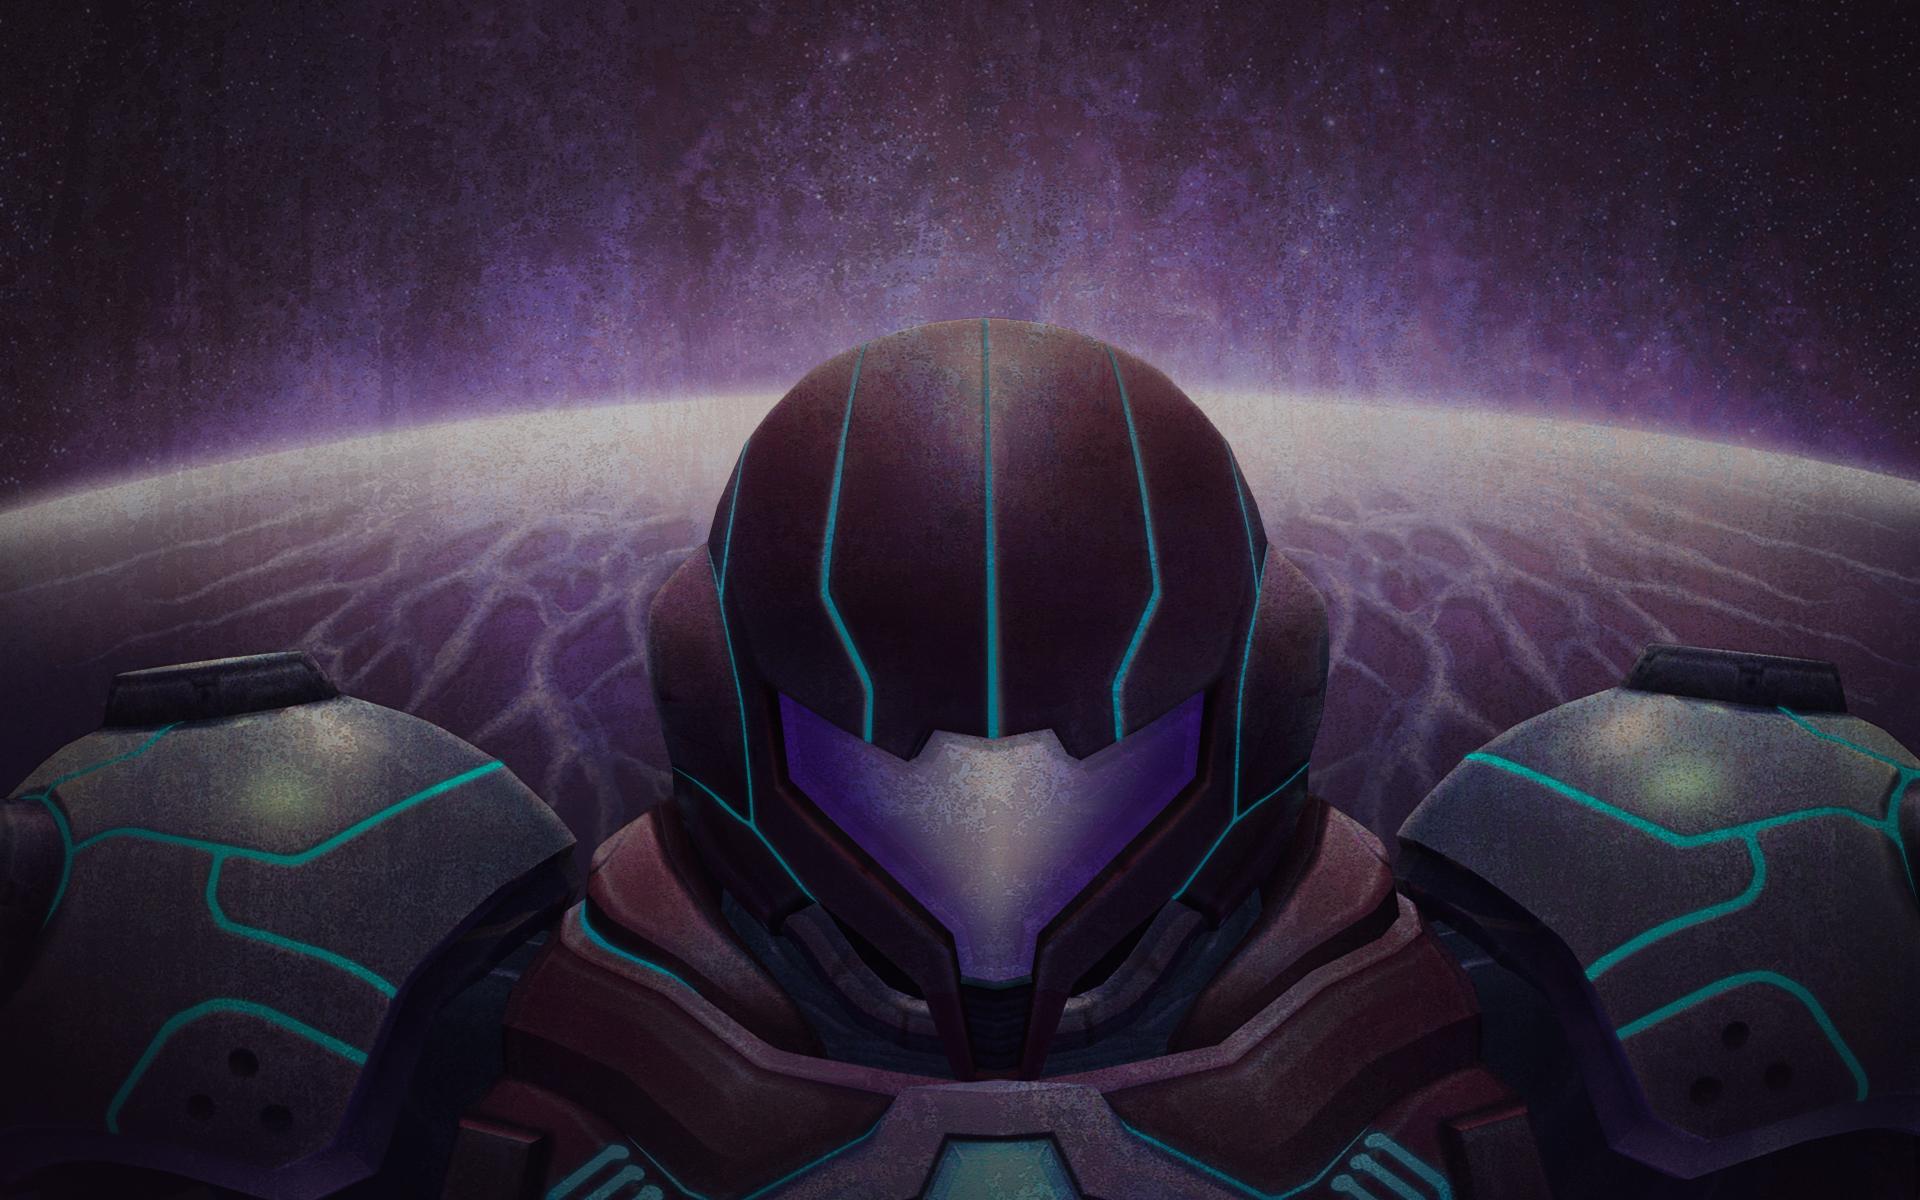 metroid prime trilogy wallpaper samus game missions